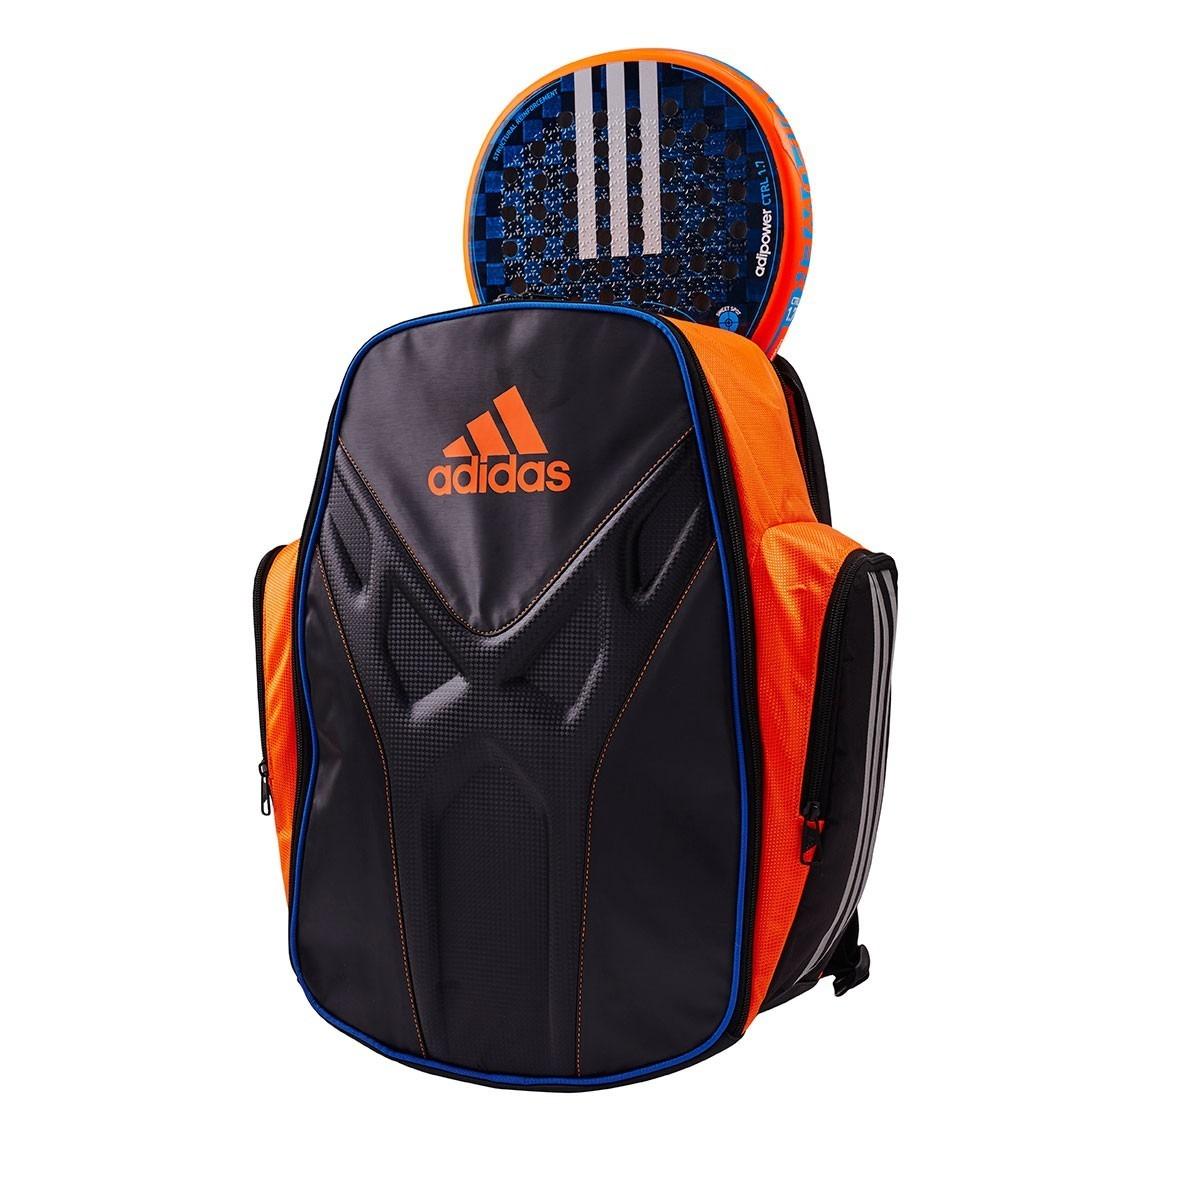 00 Sports3 Adidas 150 Padel Zaino Paletero Adipower Baires rdxCsQthB